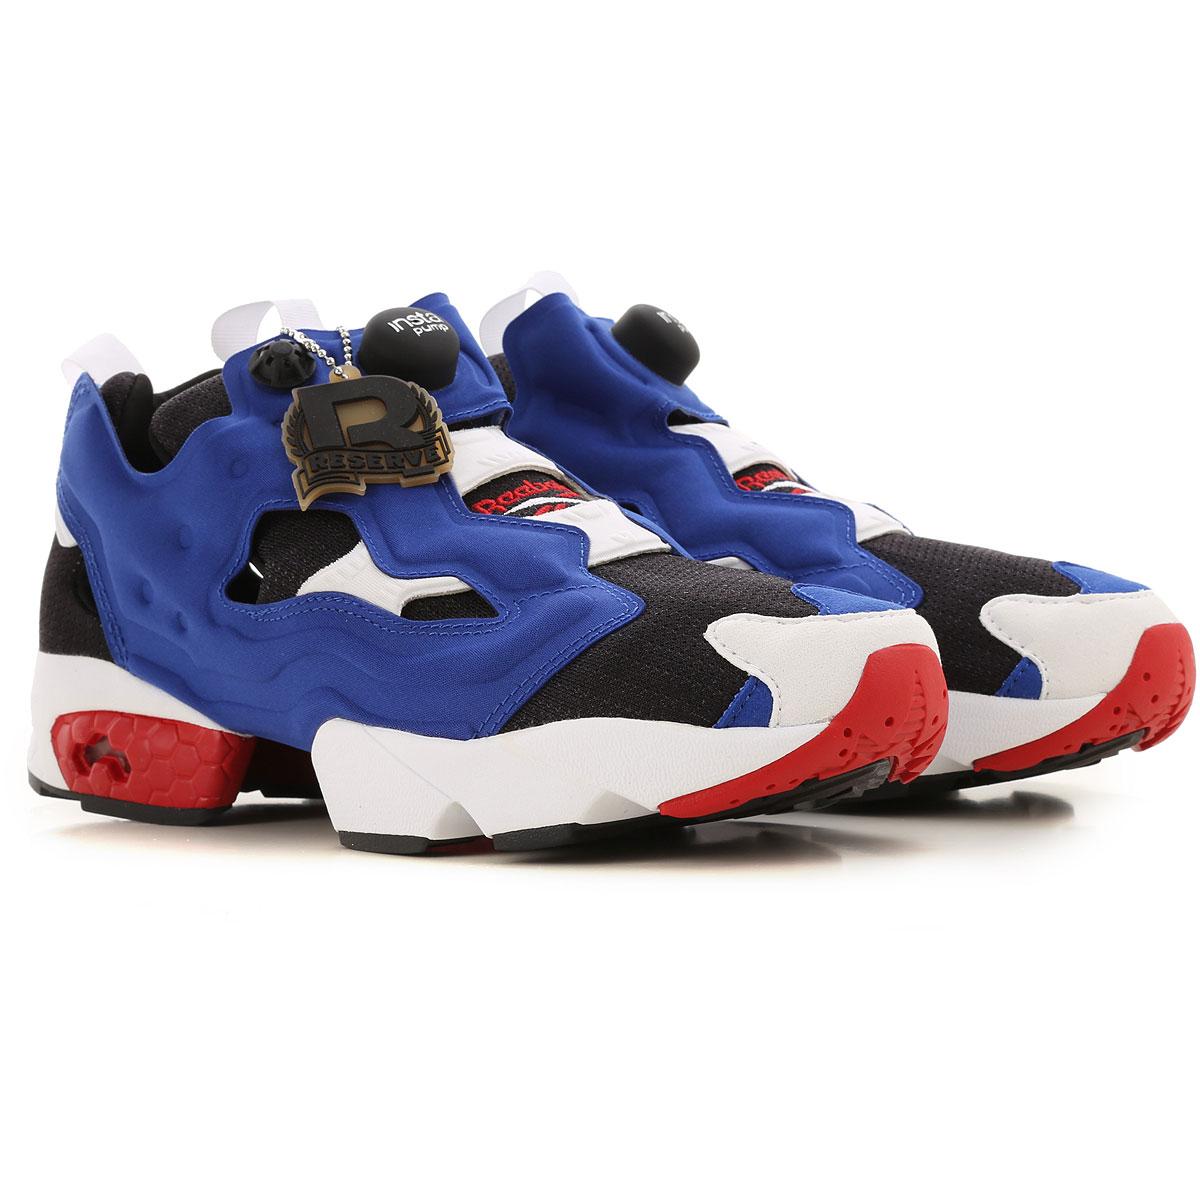 Reebok Sneakers for Men On Sale, Electric Blue, Fabric, 2019, US 11 5 - UK 11 - EU 45.5 US 7 5 - UK 6 5 - EU 40 - JP 25.5 US 8 - UK 7 - EU 40 5 - JP 2